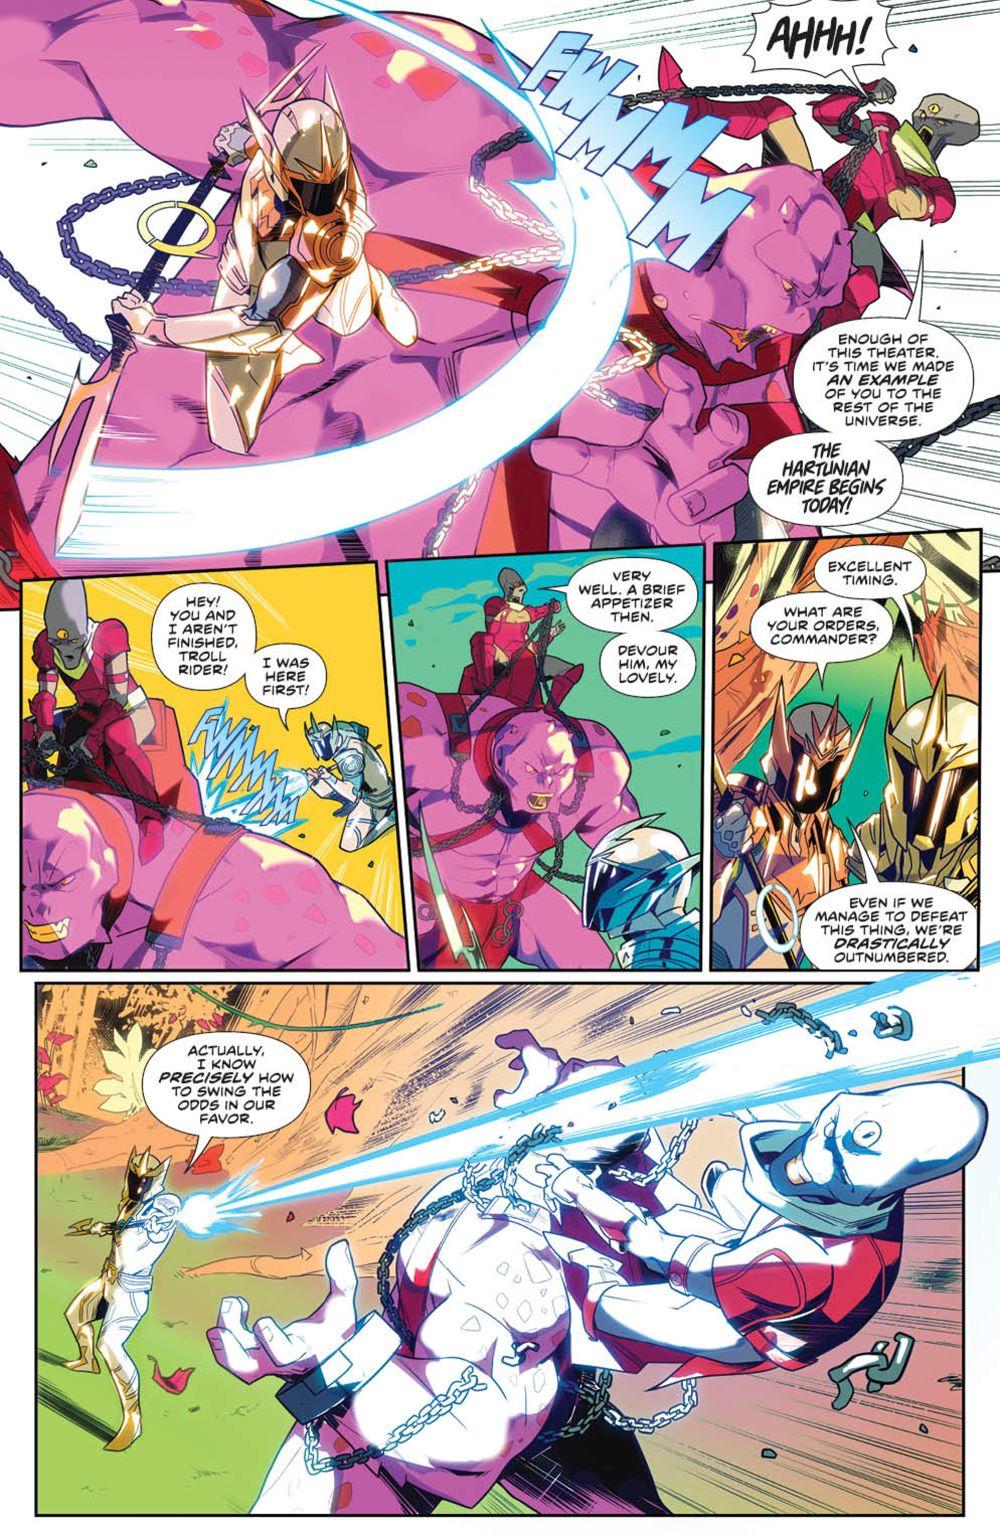 MightyMorphin_v1_SC_PRESS_9 ComicList Previews: MIGHTY MORPHIN VOLUME 1 TP